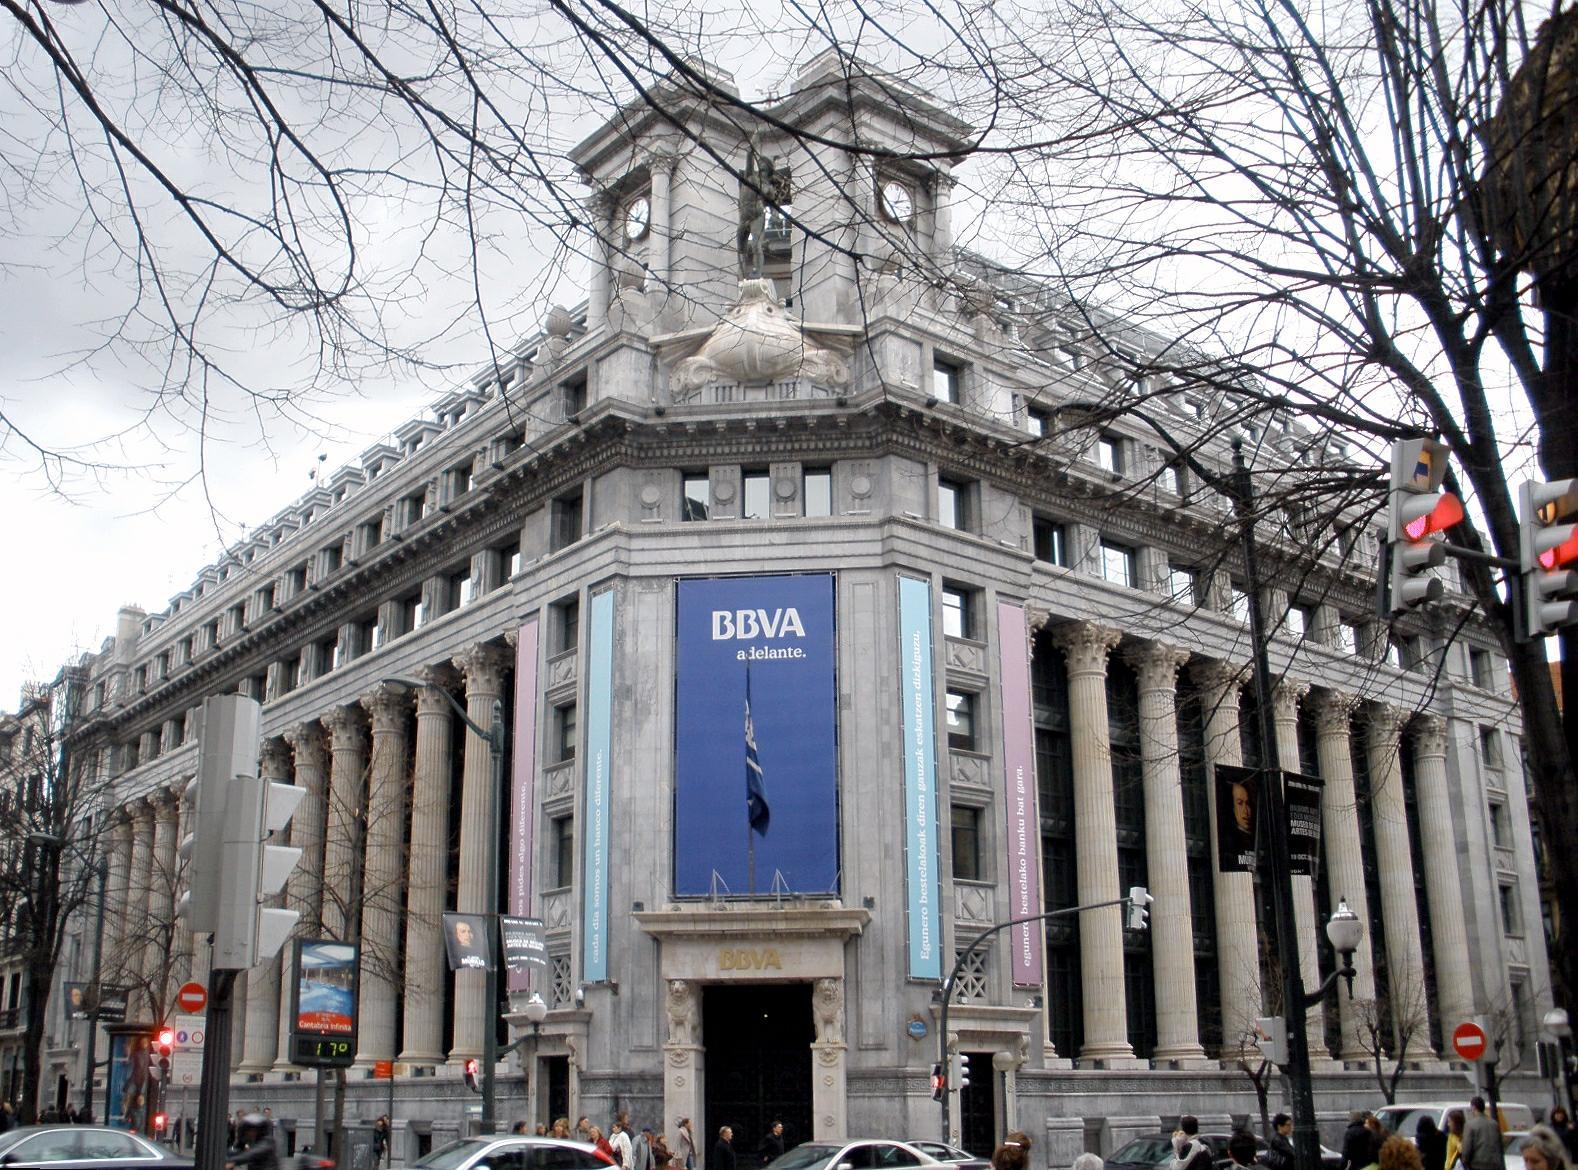 Banco bilbao vizcaya argentaria wikiwand for Oficinas banco bilbao